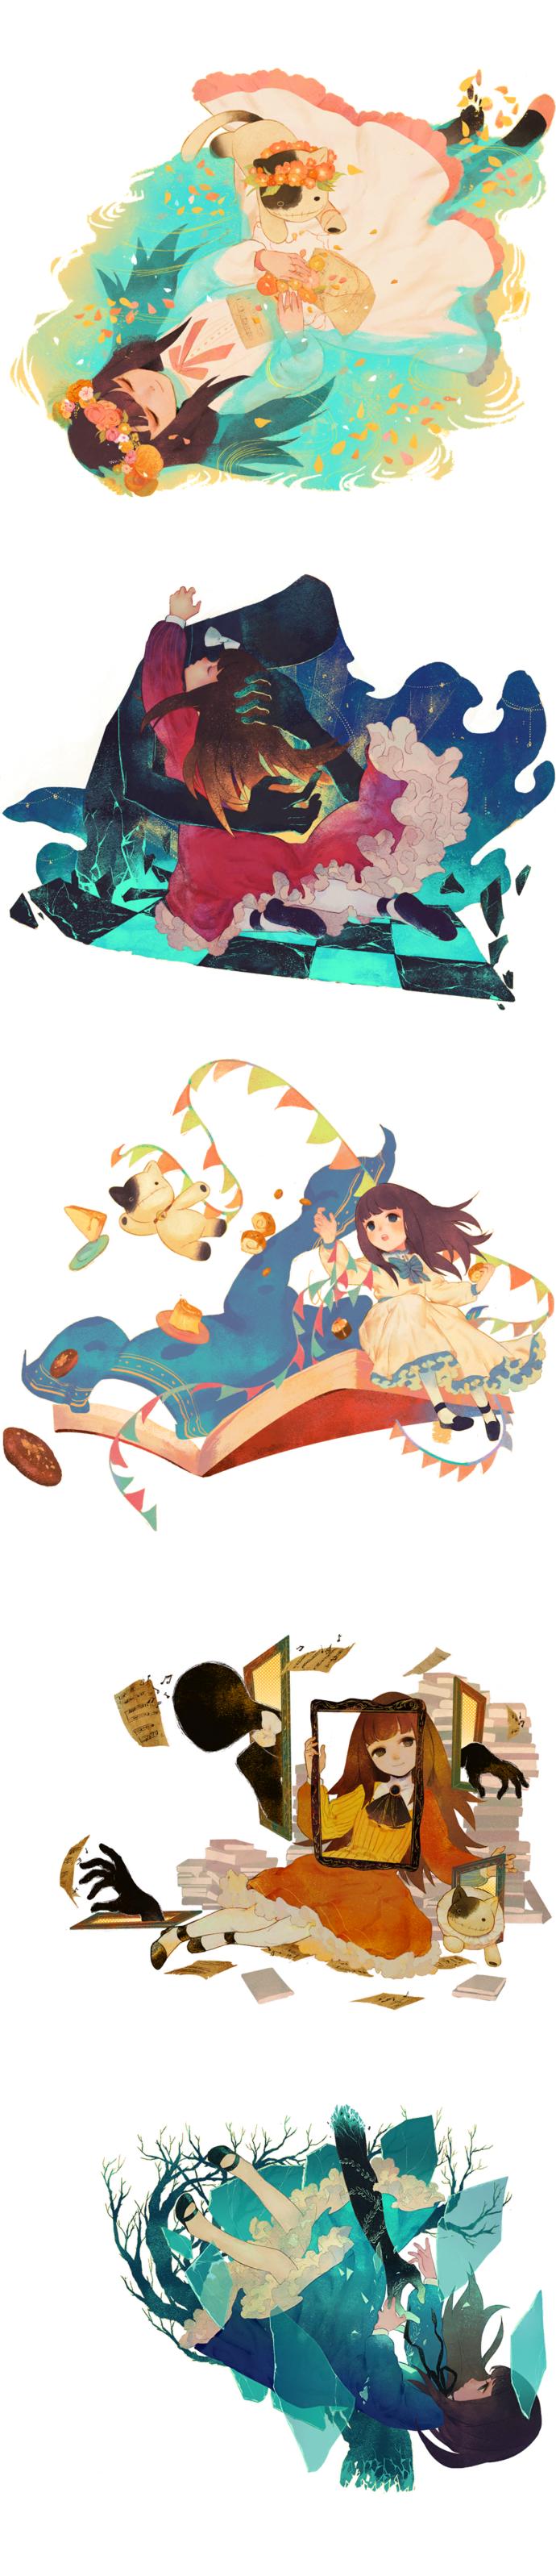 Deemo DS: Piano Collection  Eltina Samishigariya no gaisen Caramel Custard Noblesse Oblige Hanomai